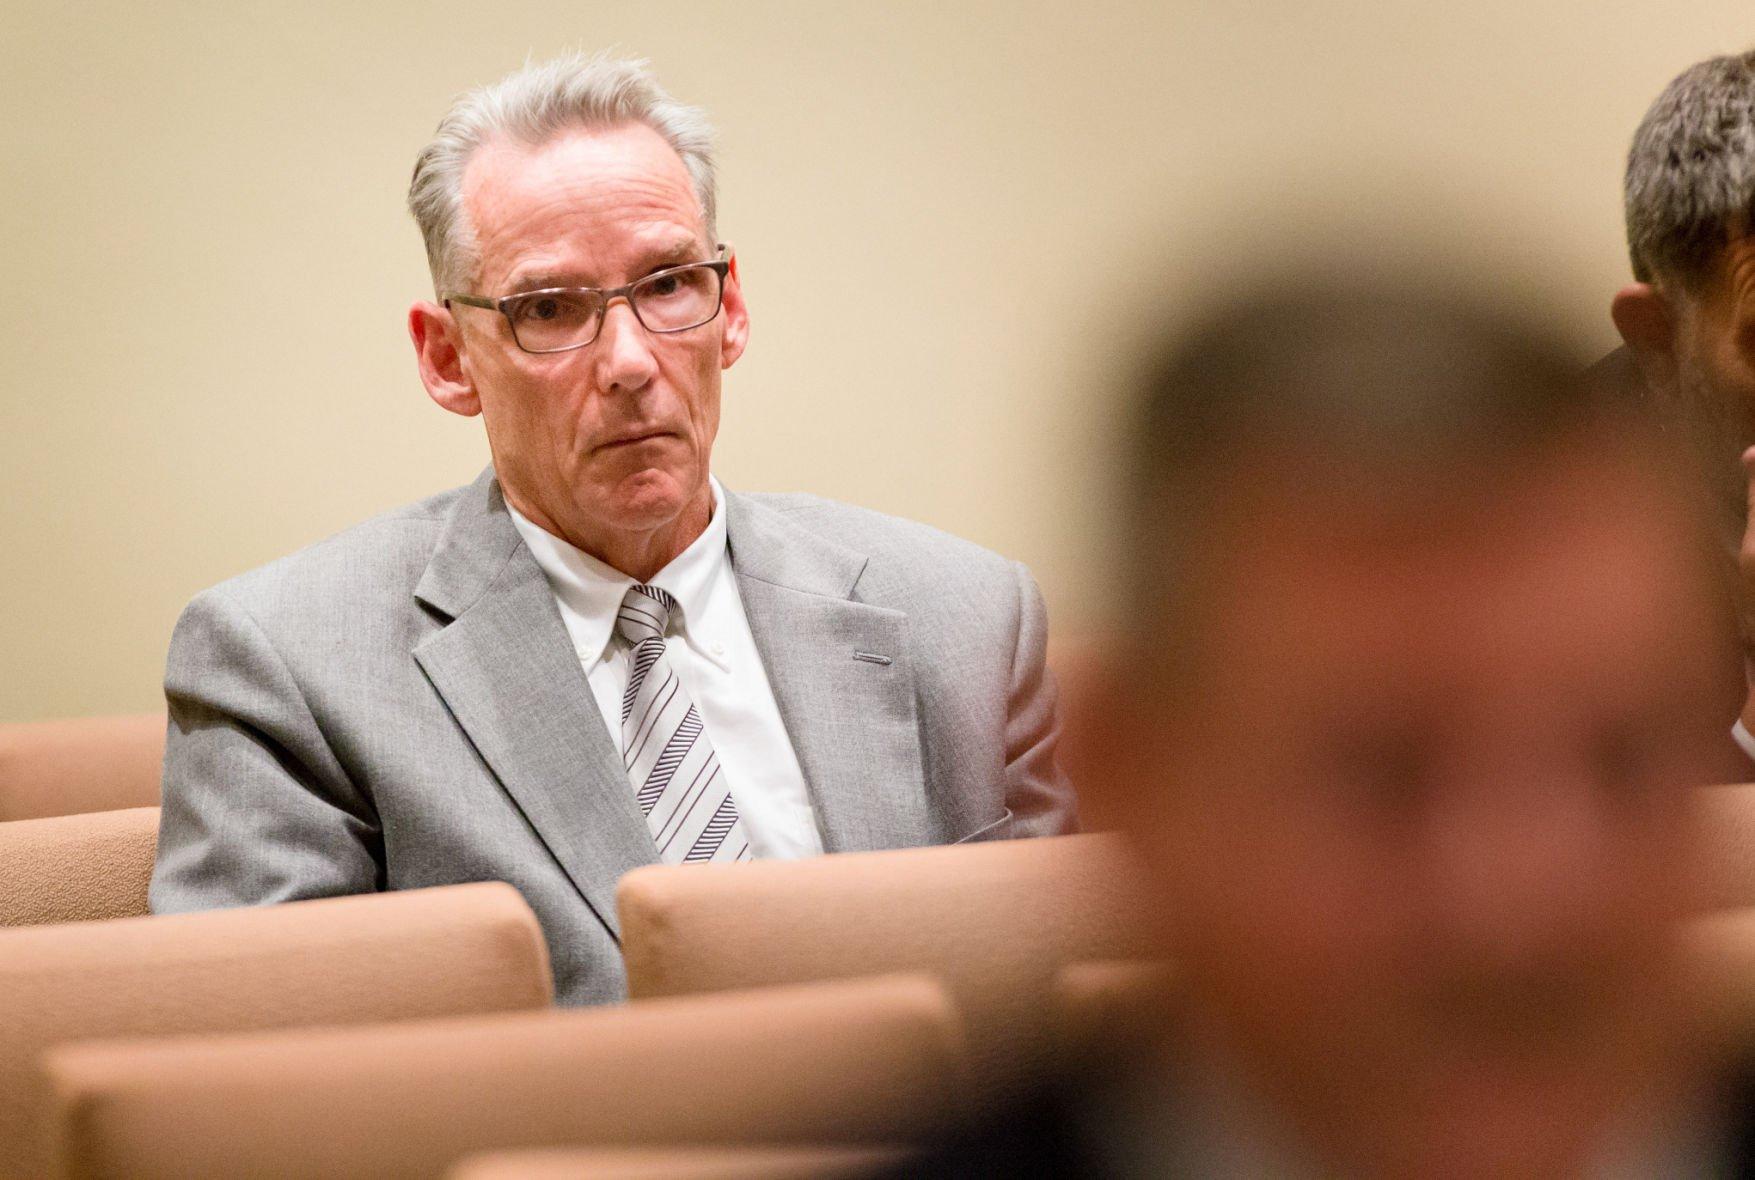 PRISON HEARING George Green Bombshellu0027 disclosure by state